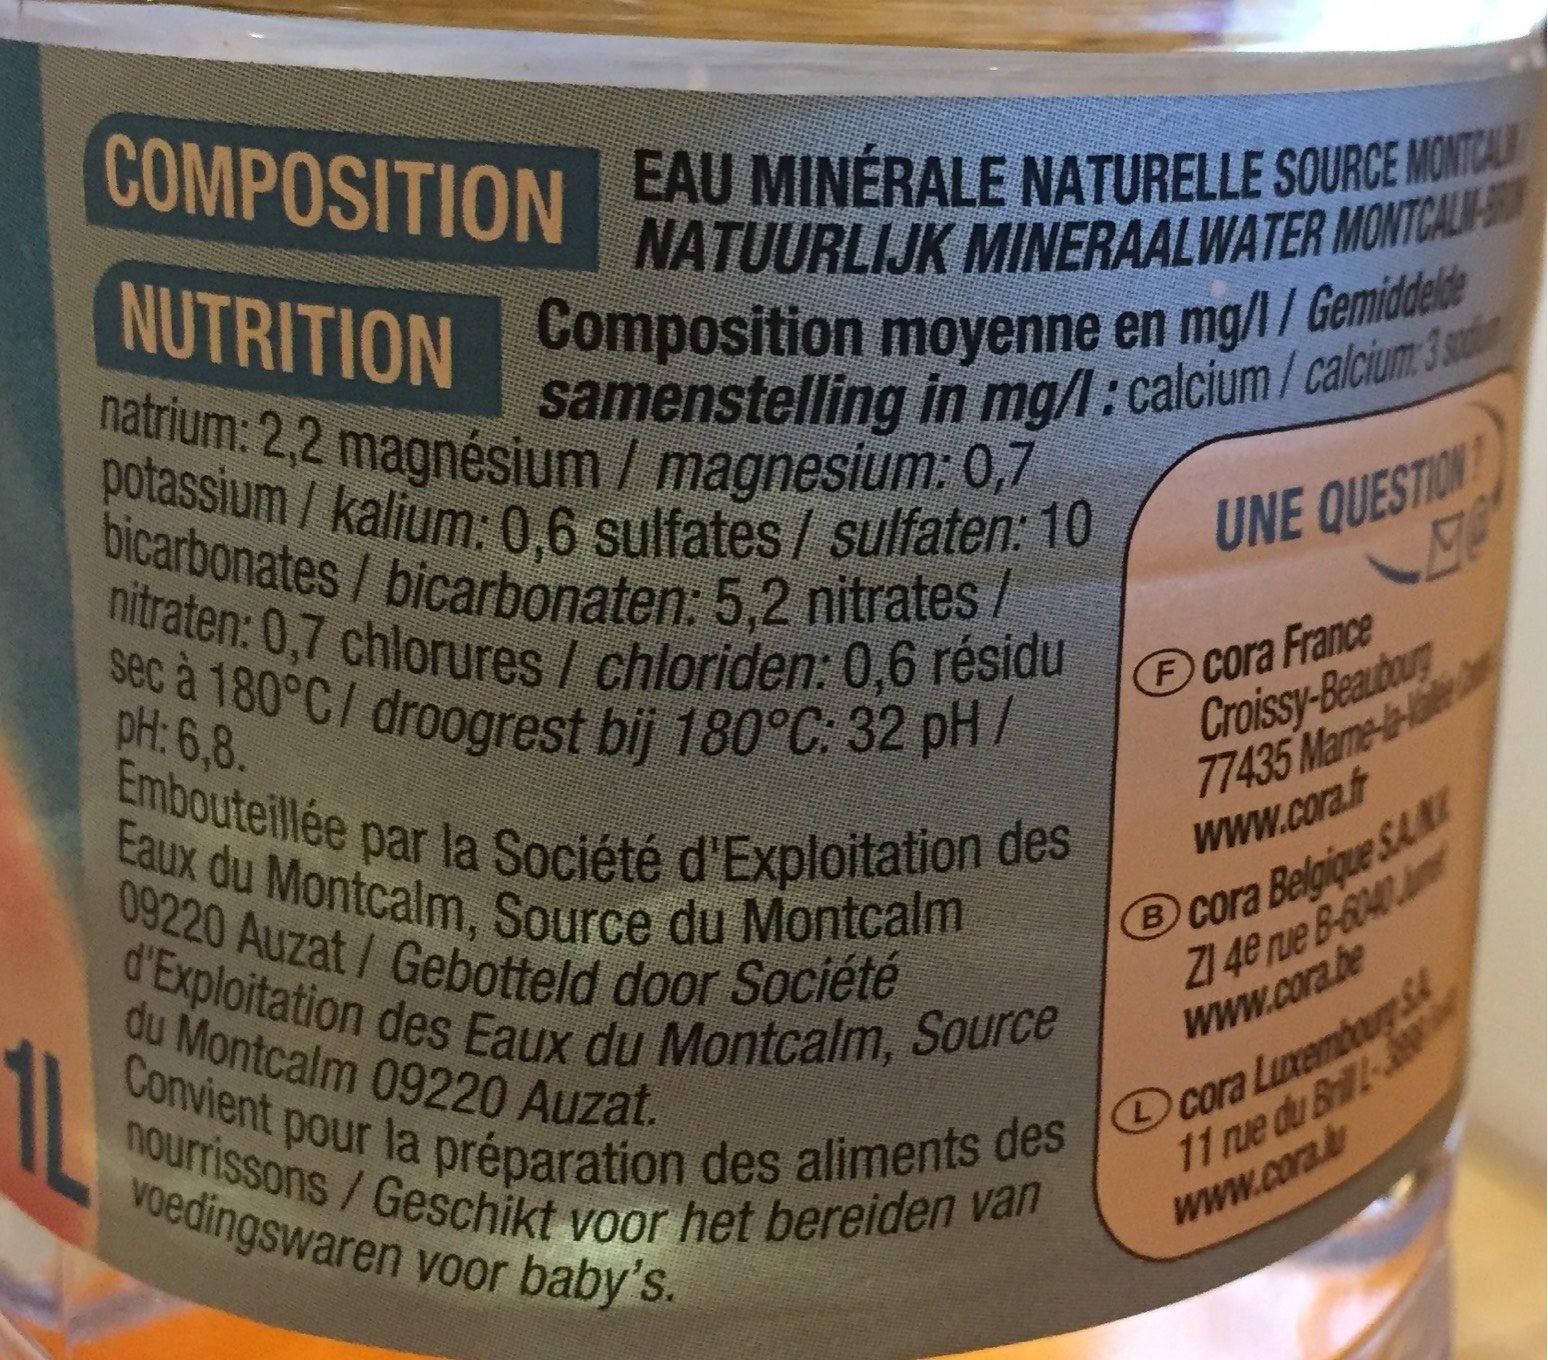 Eau minerale naturelle - Voedingswaarden - fr